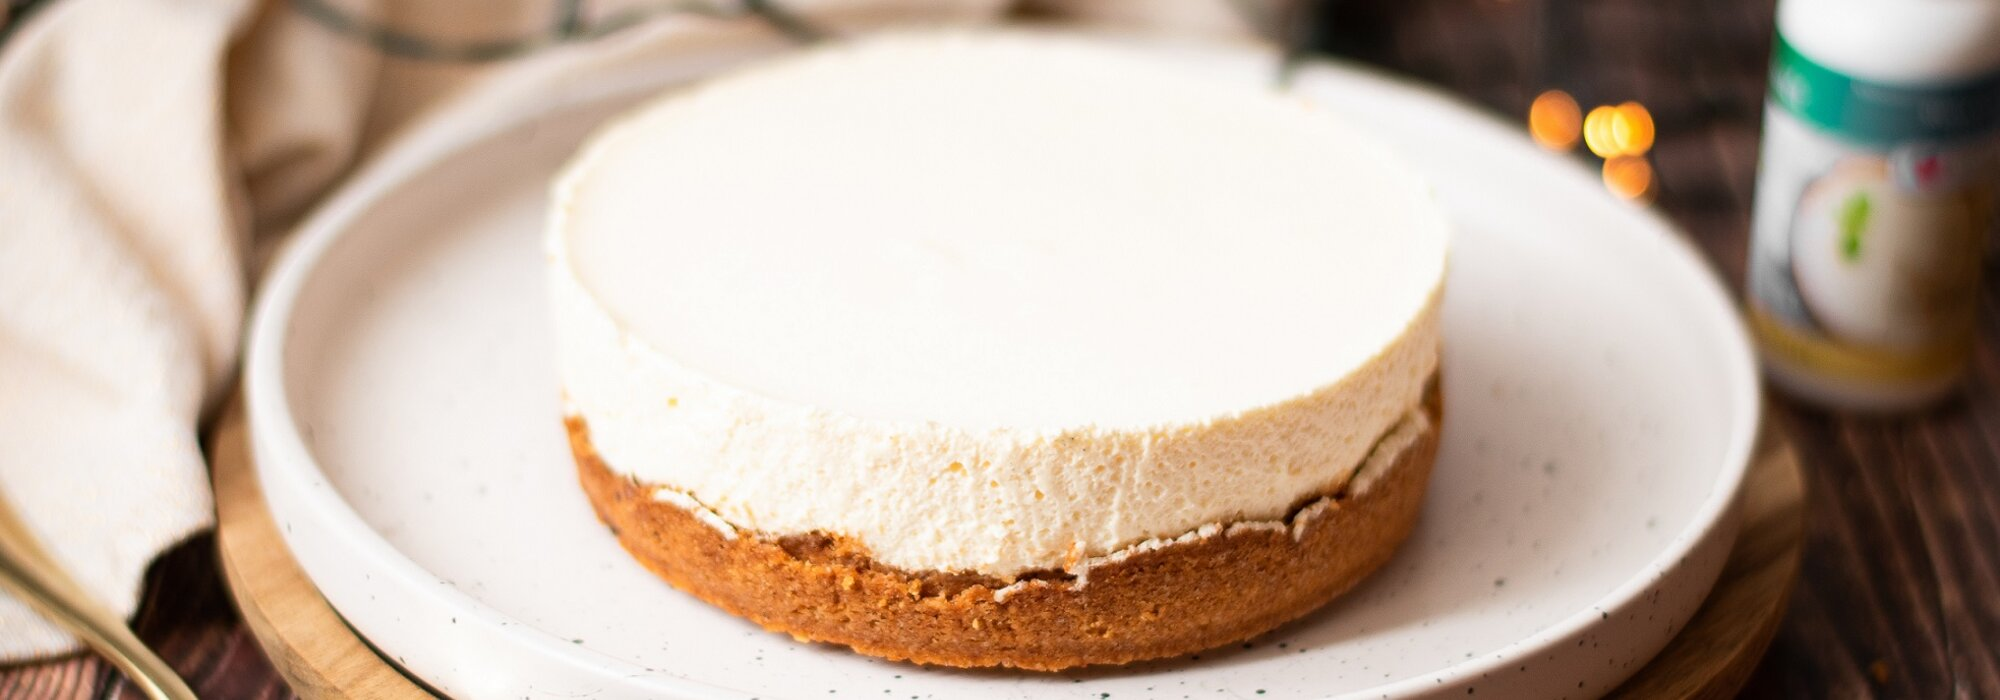 Koolhydraatarme New York cheesecake